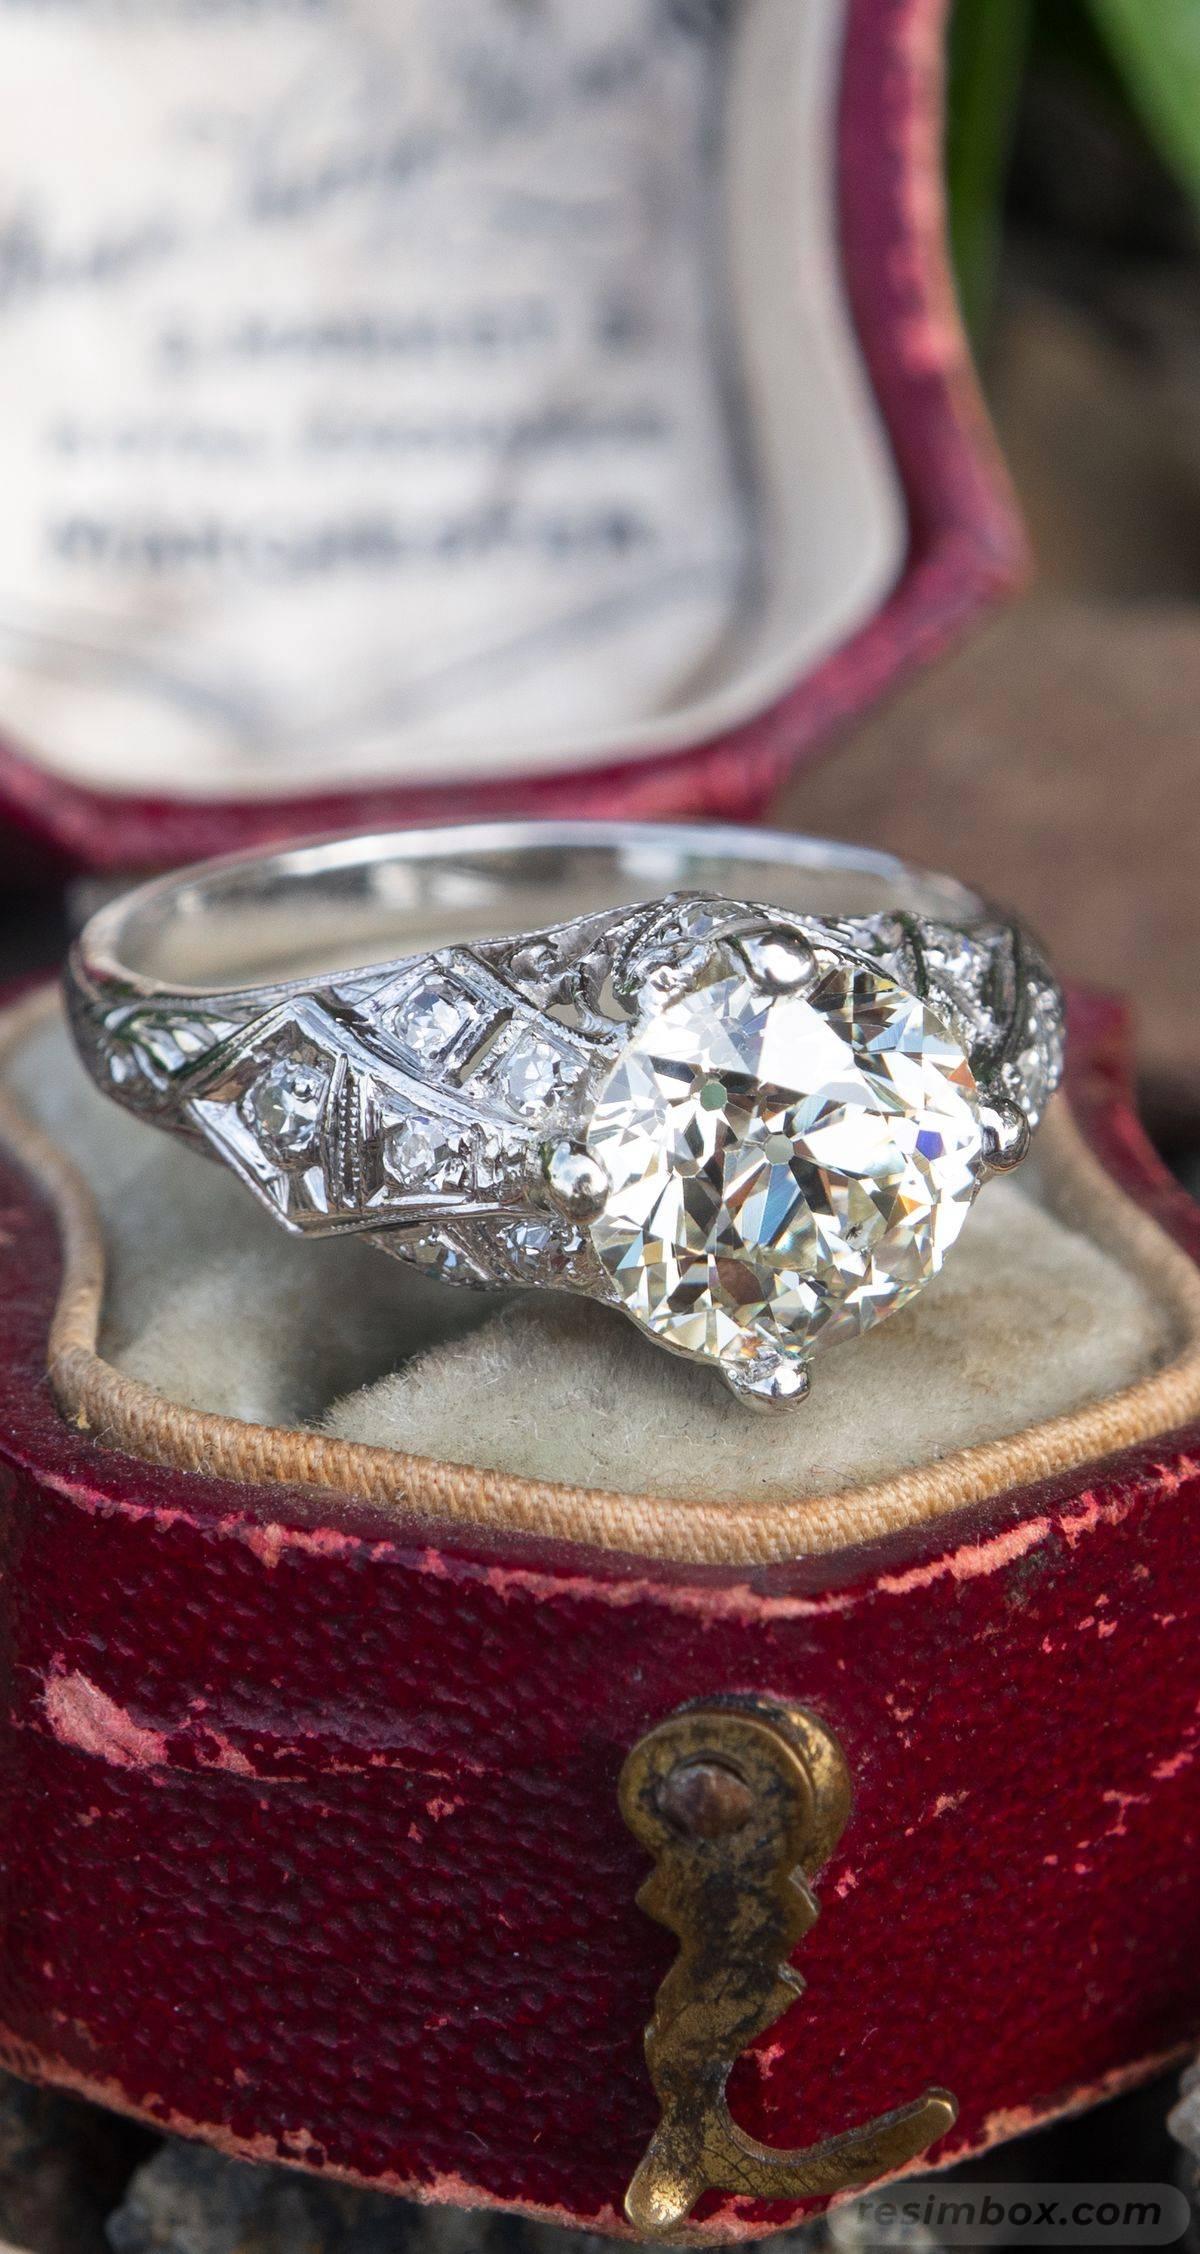 Art deco engagement ring-104708760072697388